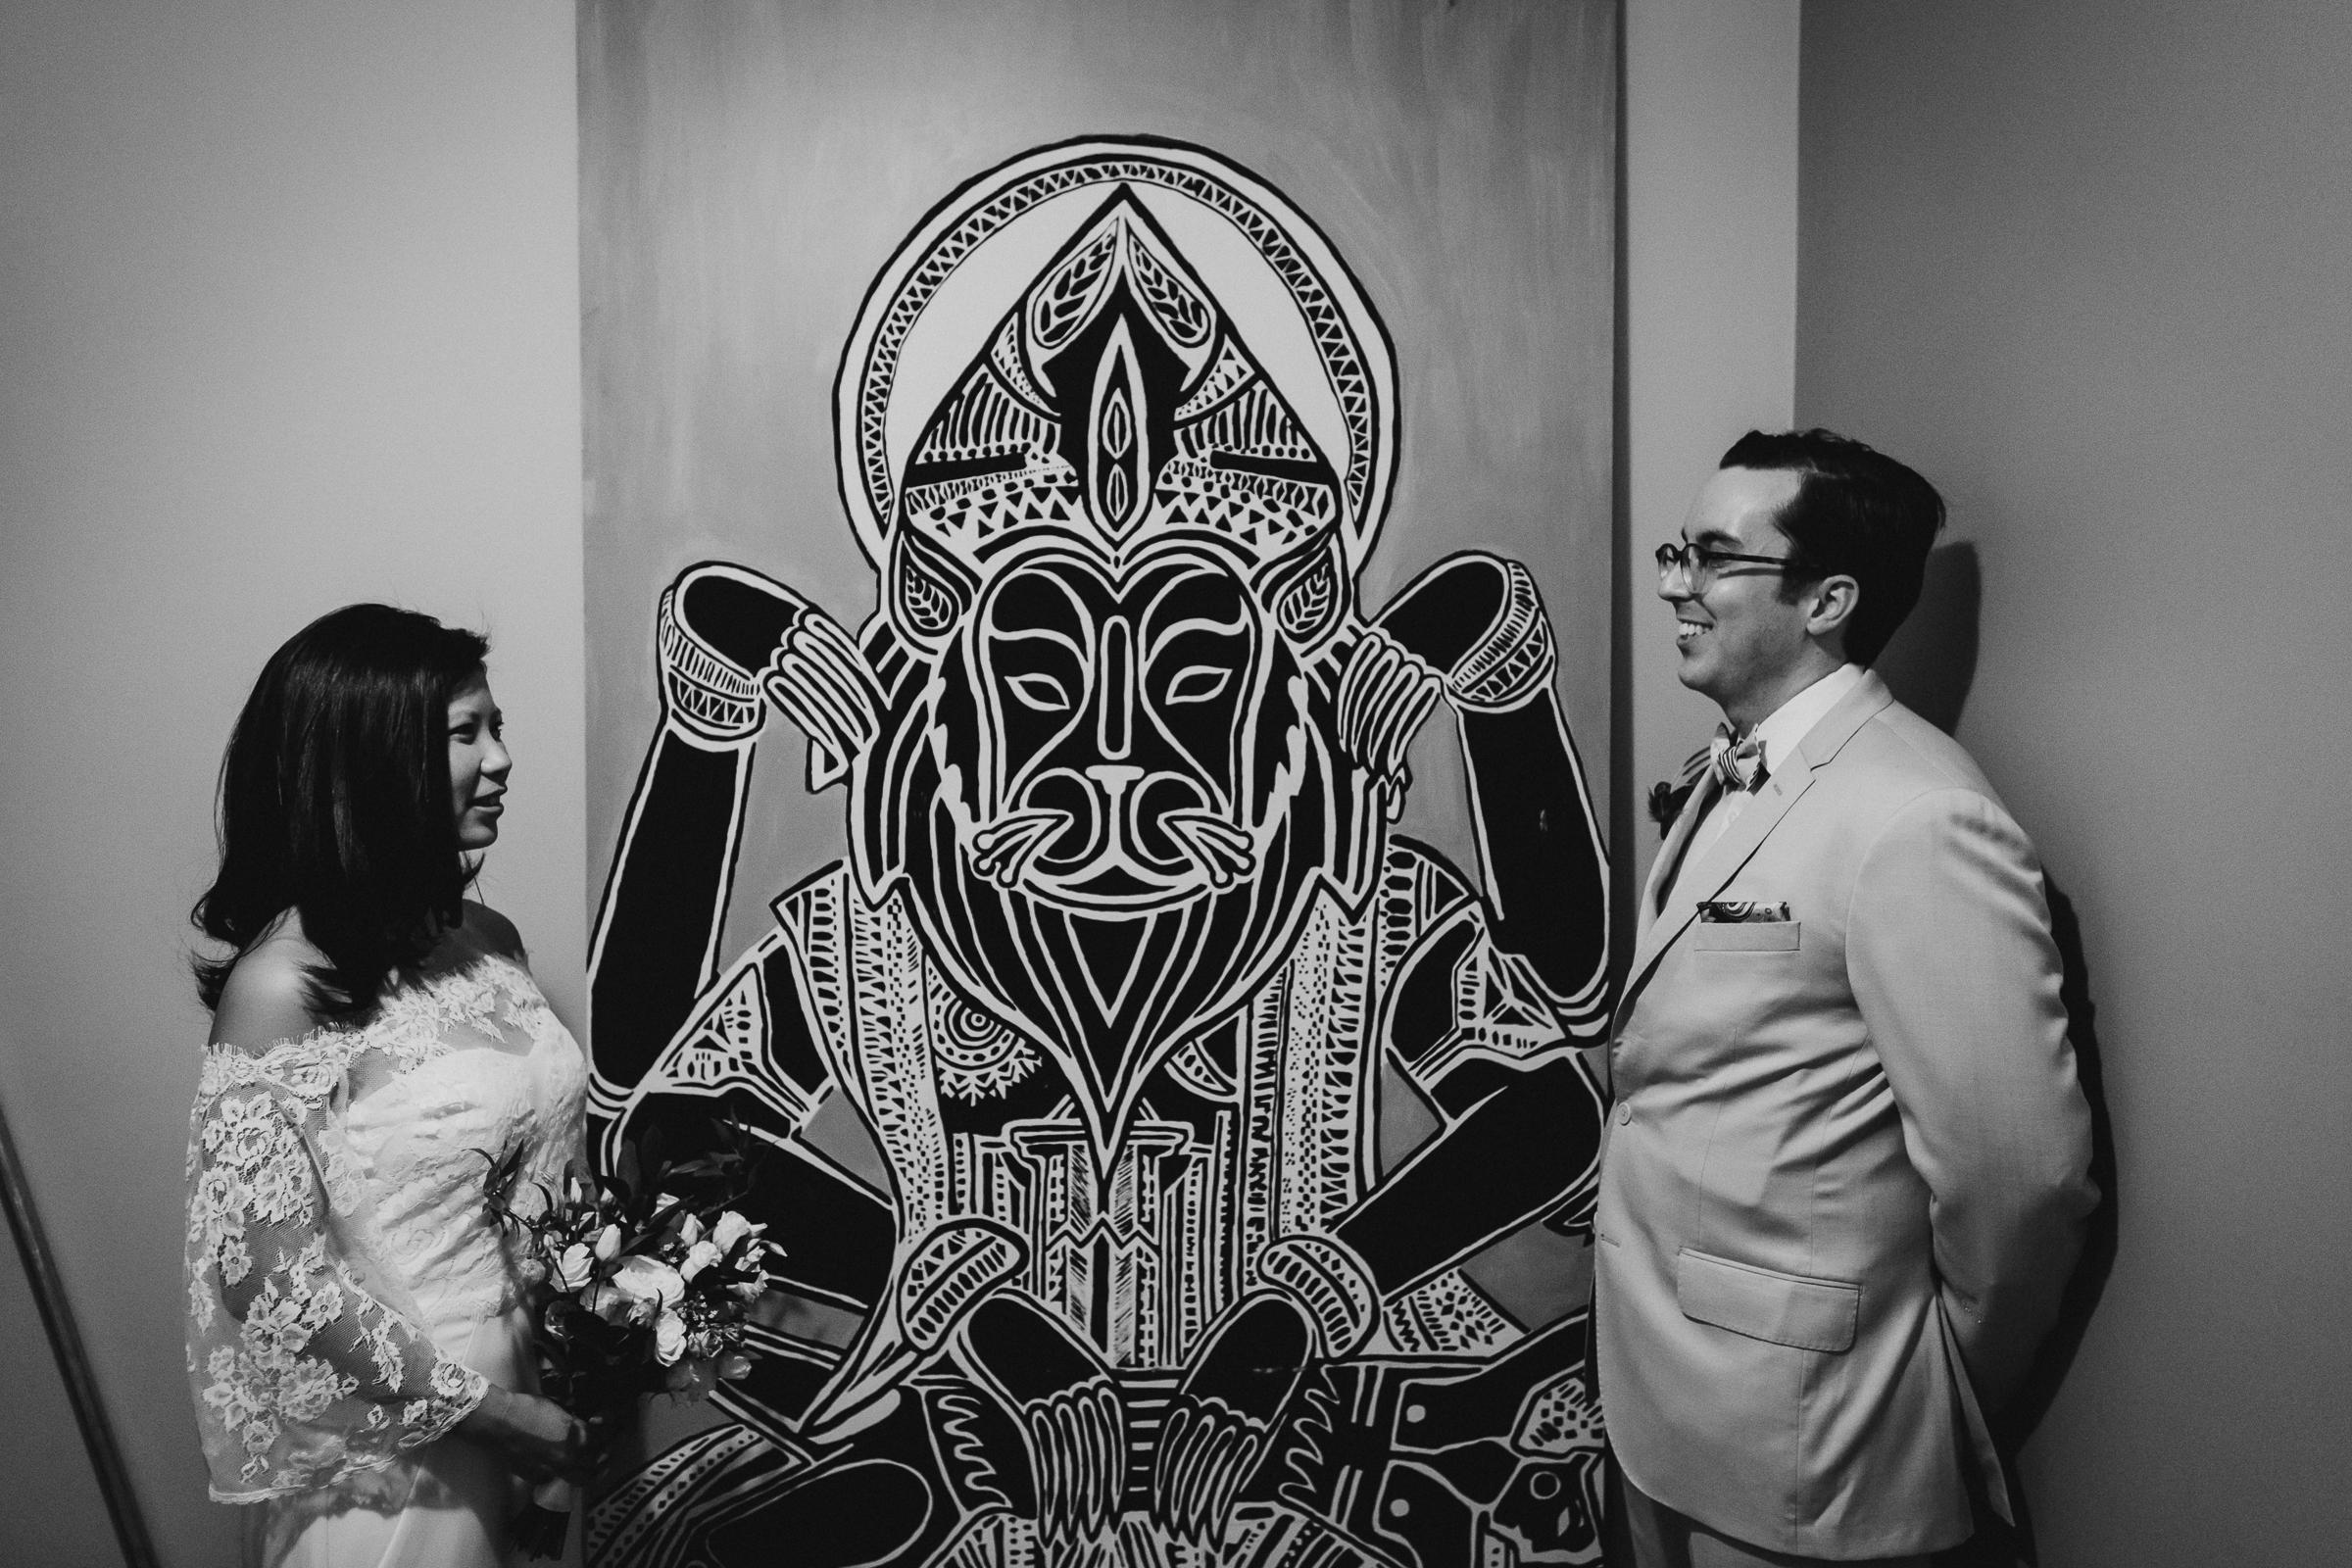 The-Bhakti-Center-Yoga-NYC-Rooftop-Documentary-Wedding-Photographer-24.jpg